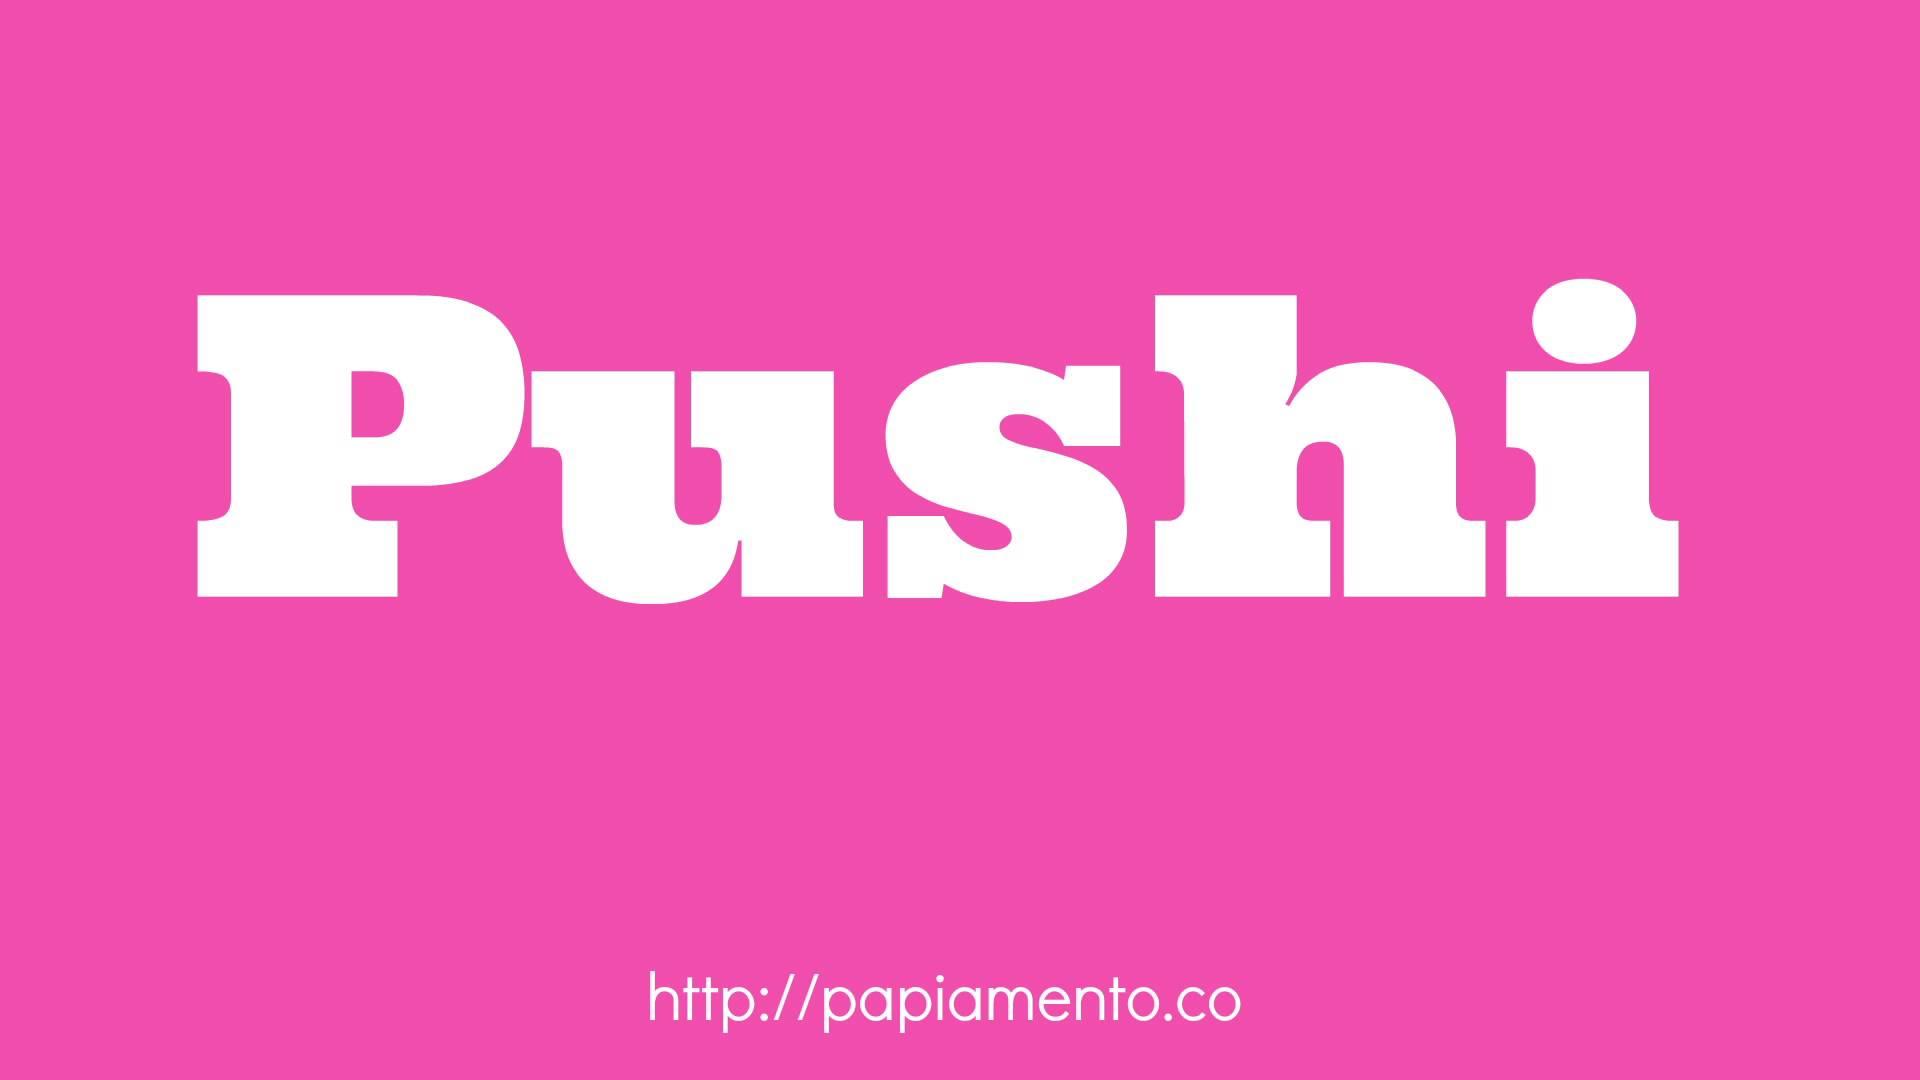 Zo Zeg Je Poes (Pushi) In Papiamentu